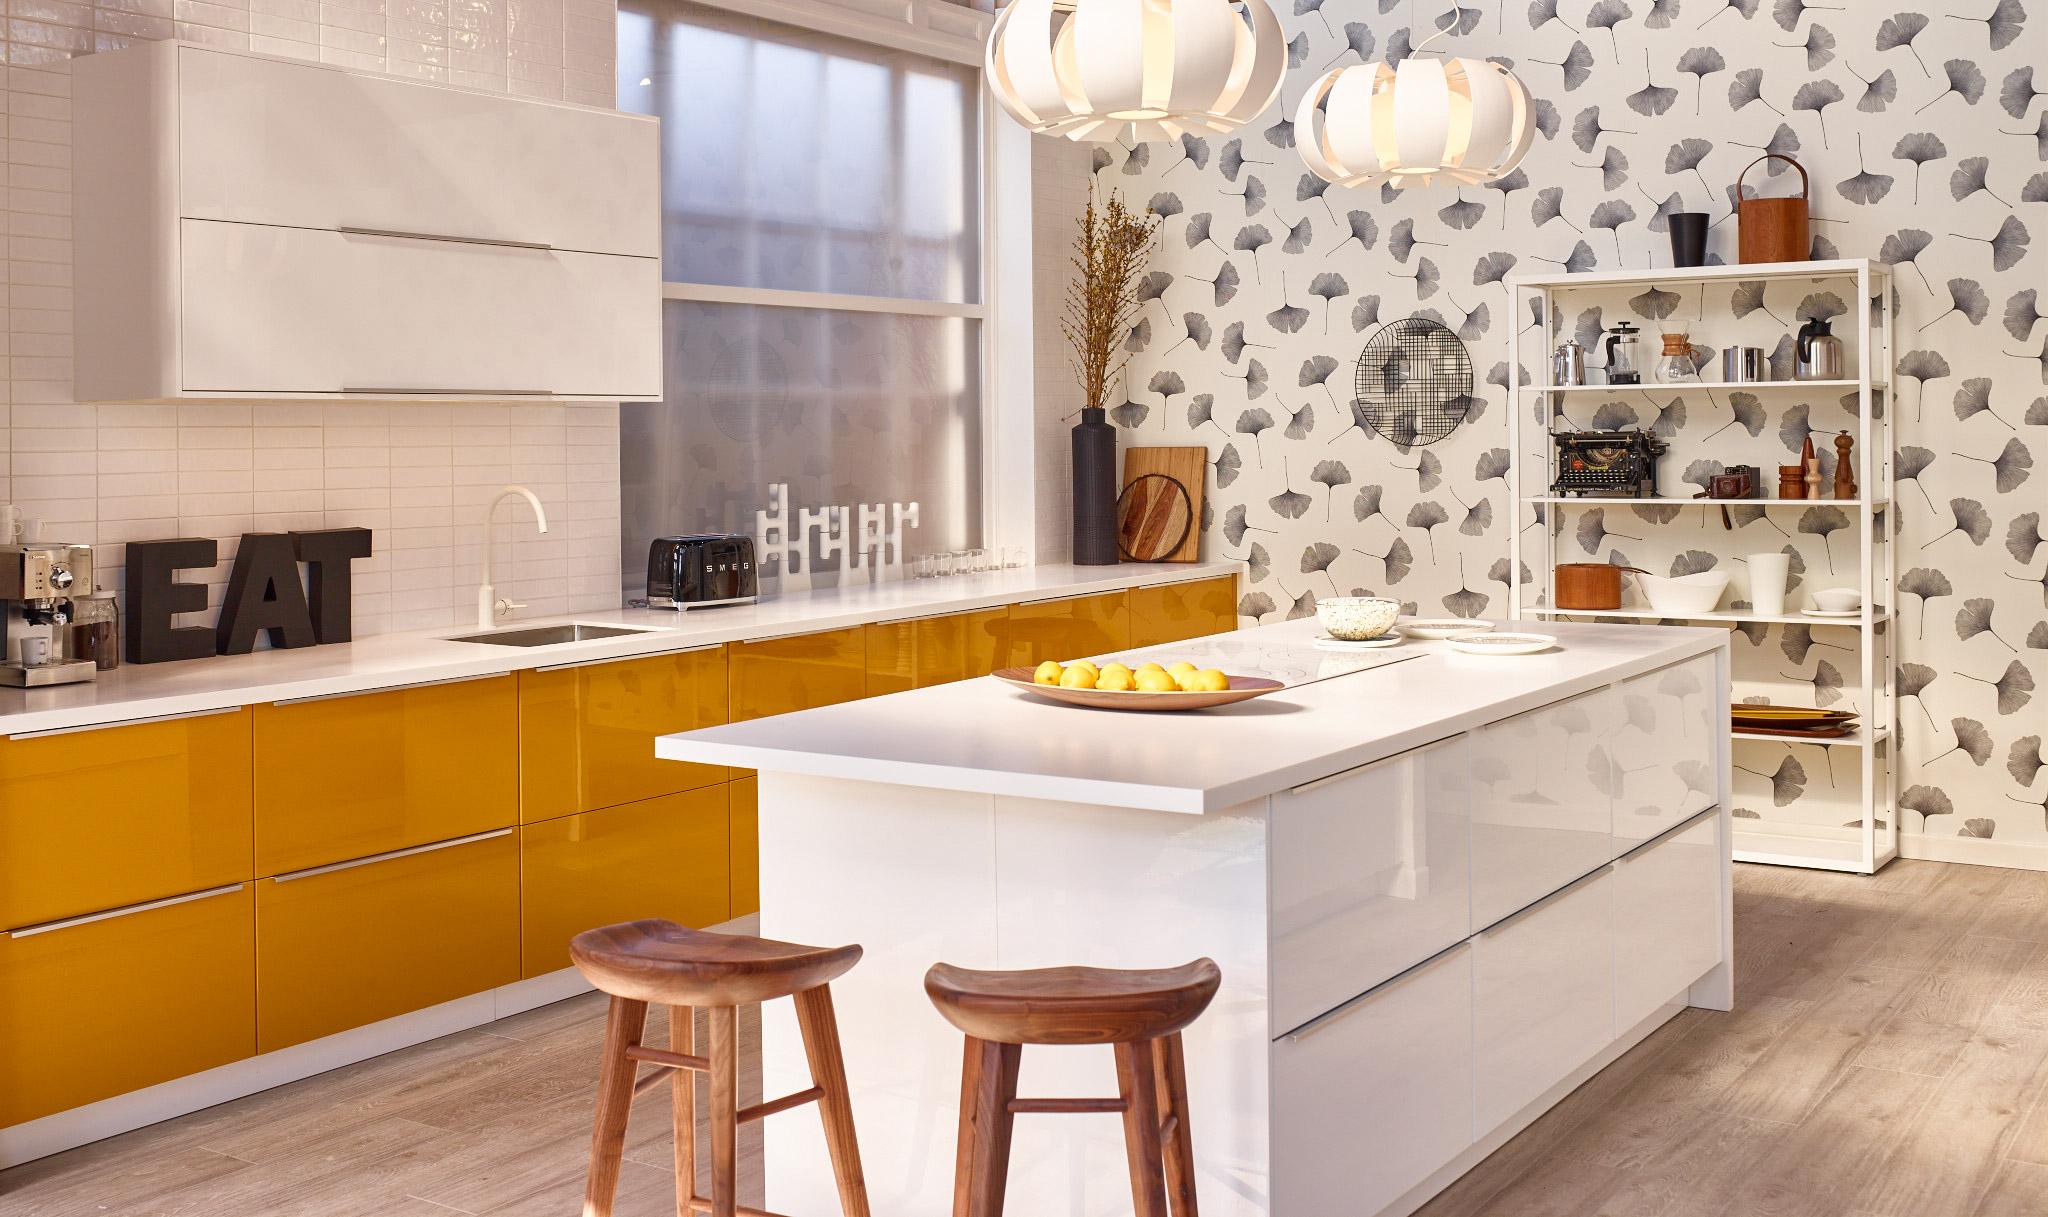 IKEA-shayne-gray-kareen-mallon30665.jpg